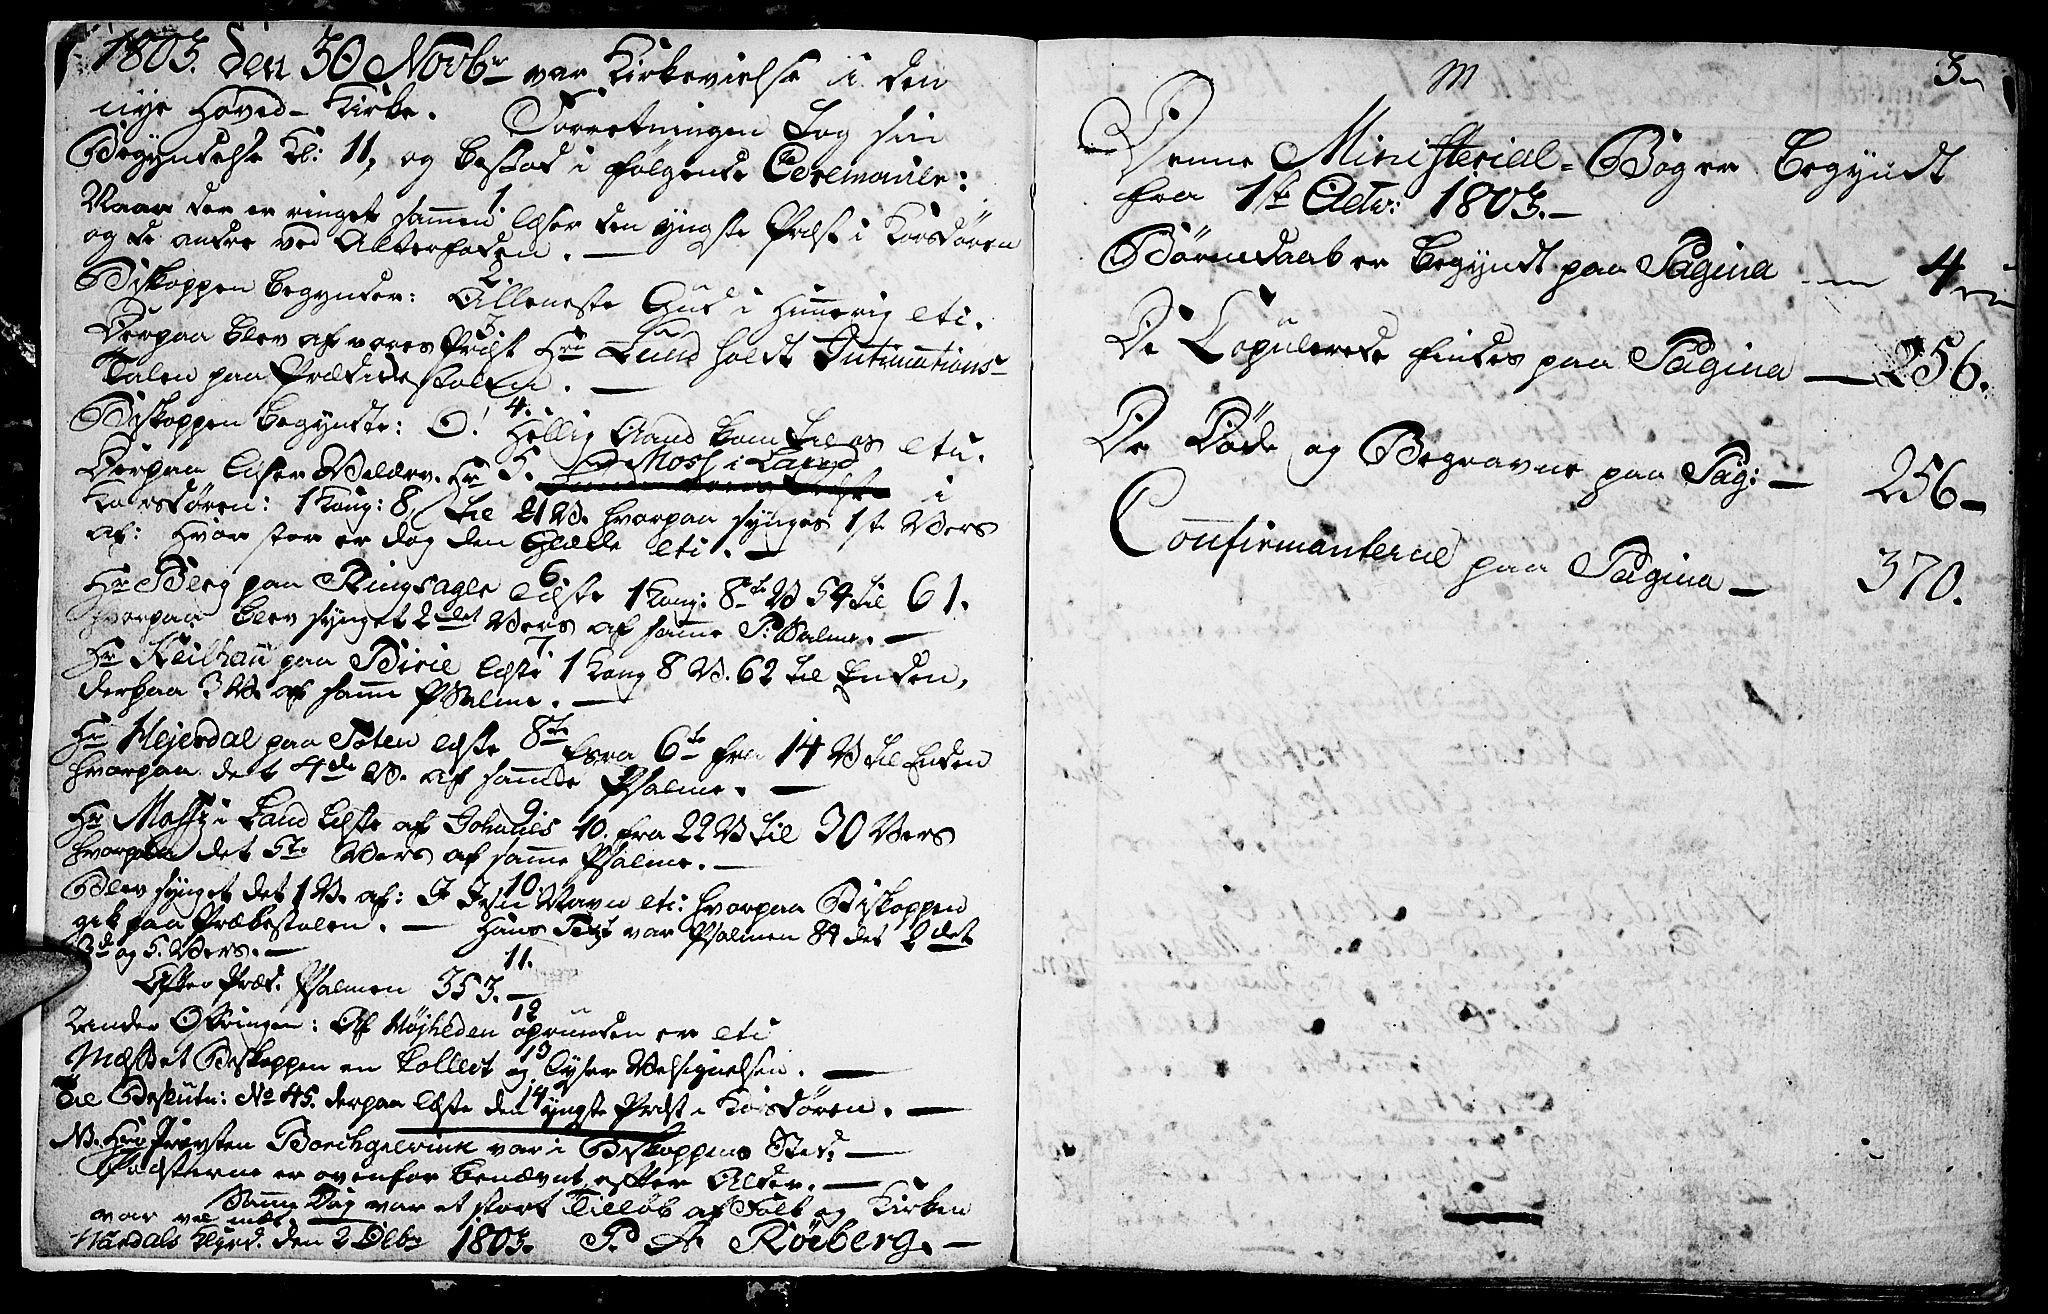 SAH, Vardal prestekontor, H/Ha/Hab/L0003: Klokkerbok nr. 3, 1803-1808, s. 2-3